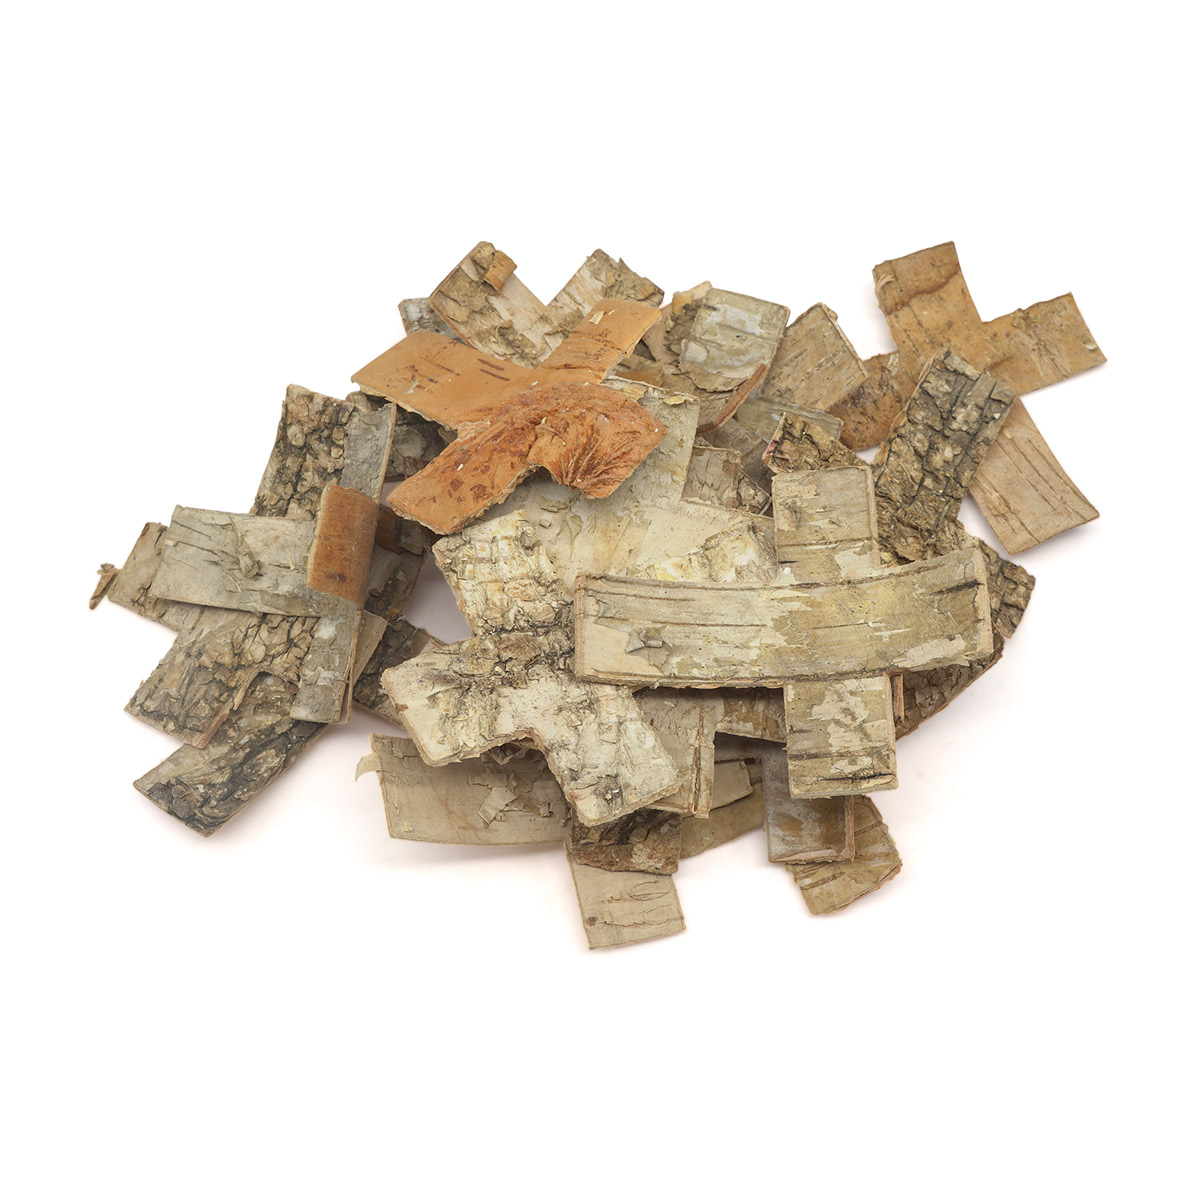 YW293 Декоративные элементы из коры дерева 'Крест', 6,5*5см , 25шт/уп